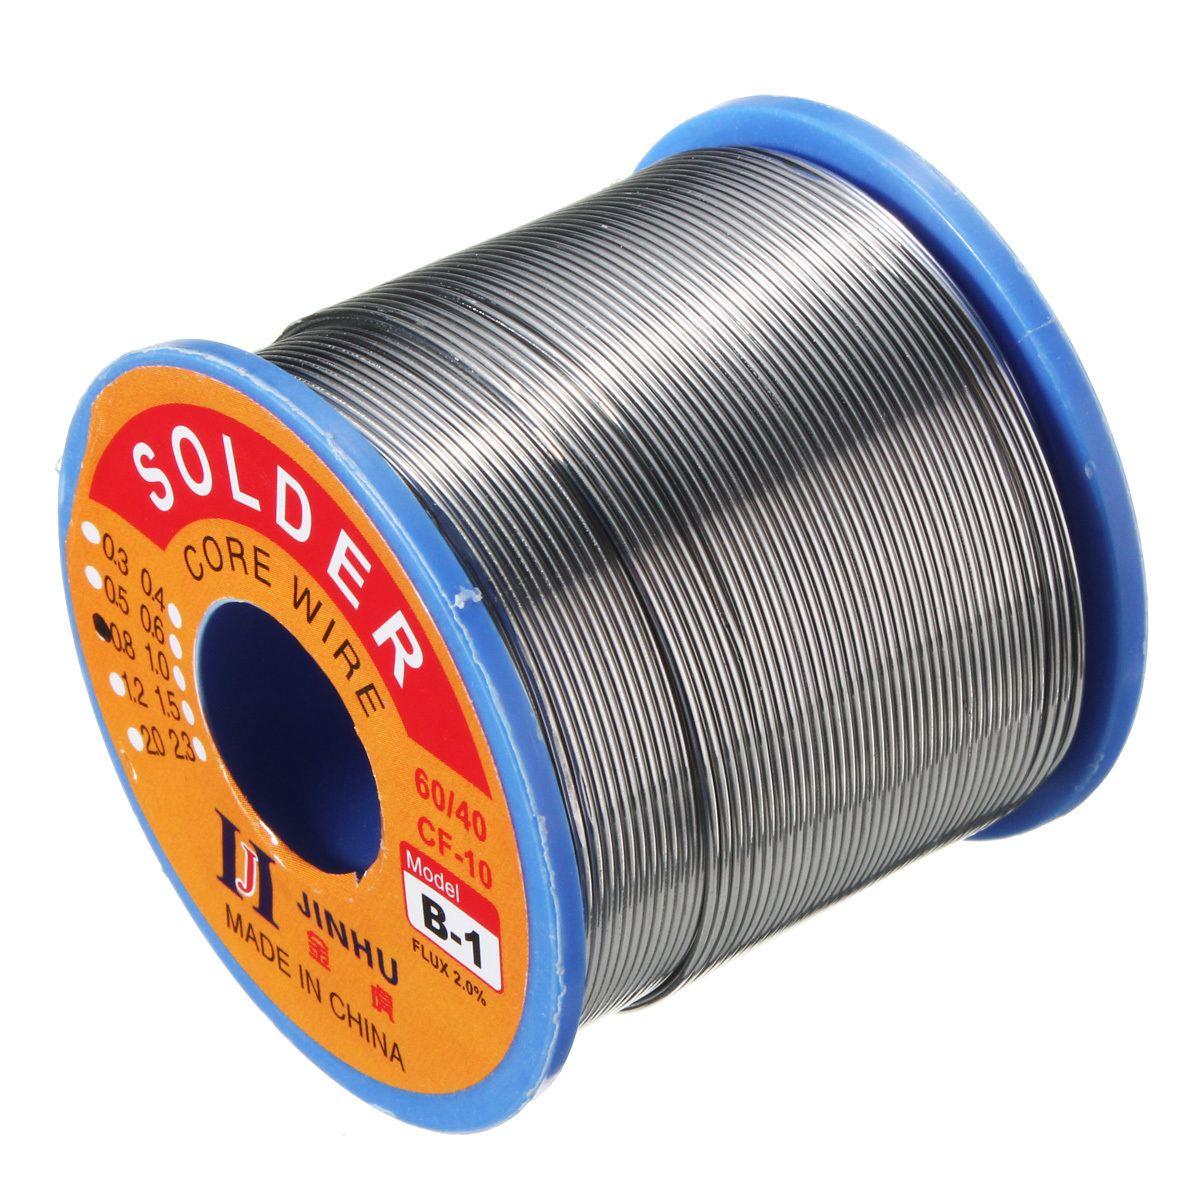 500g 60/40 pb Solder Wire Rosin Core Saldatura 2% Flux 0.7 Mm 1 Bobina